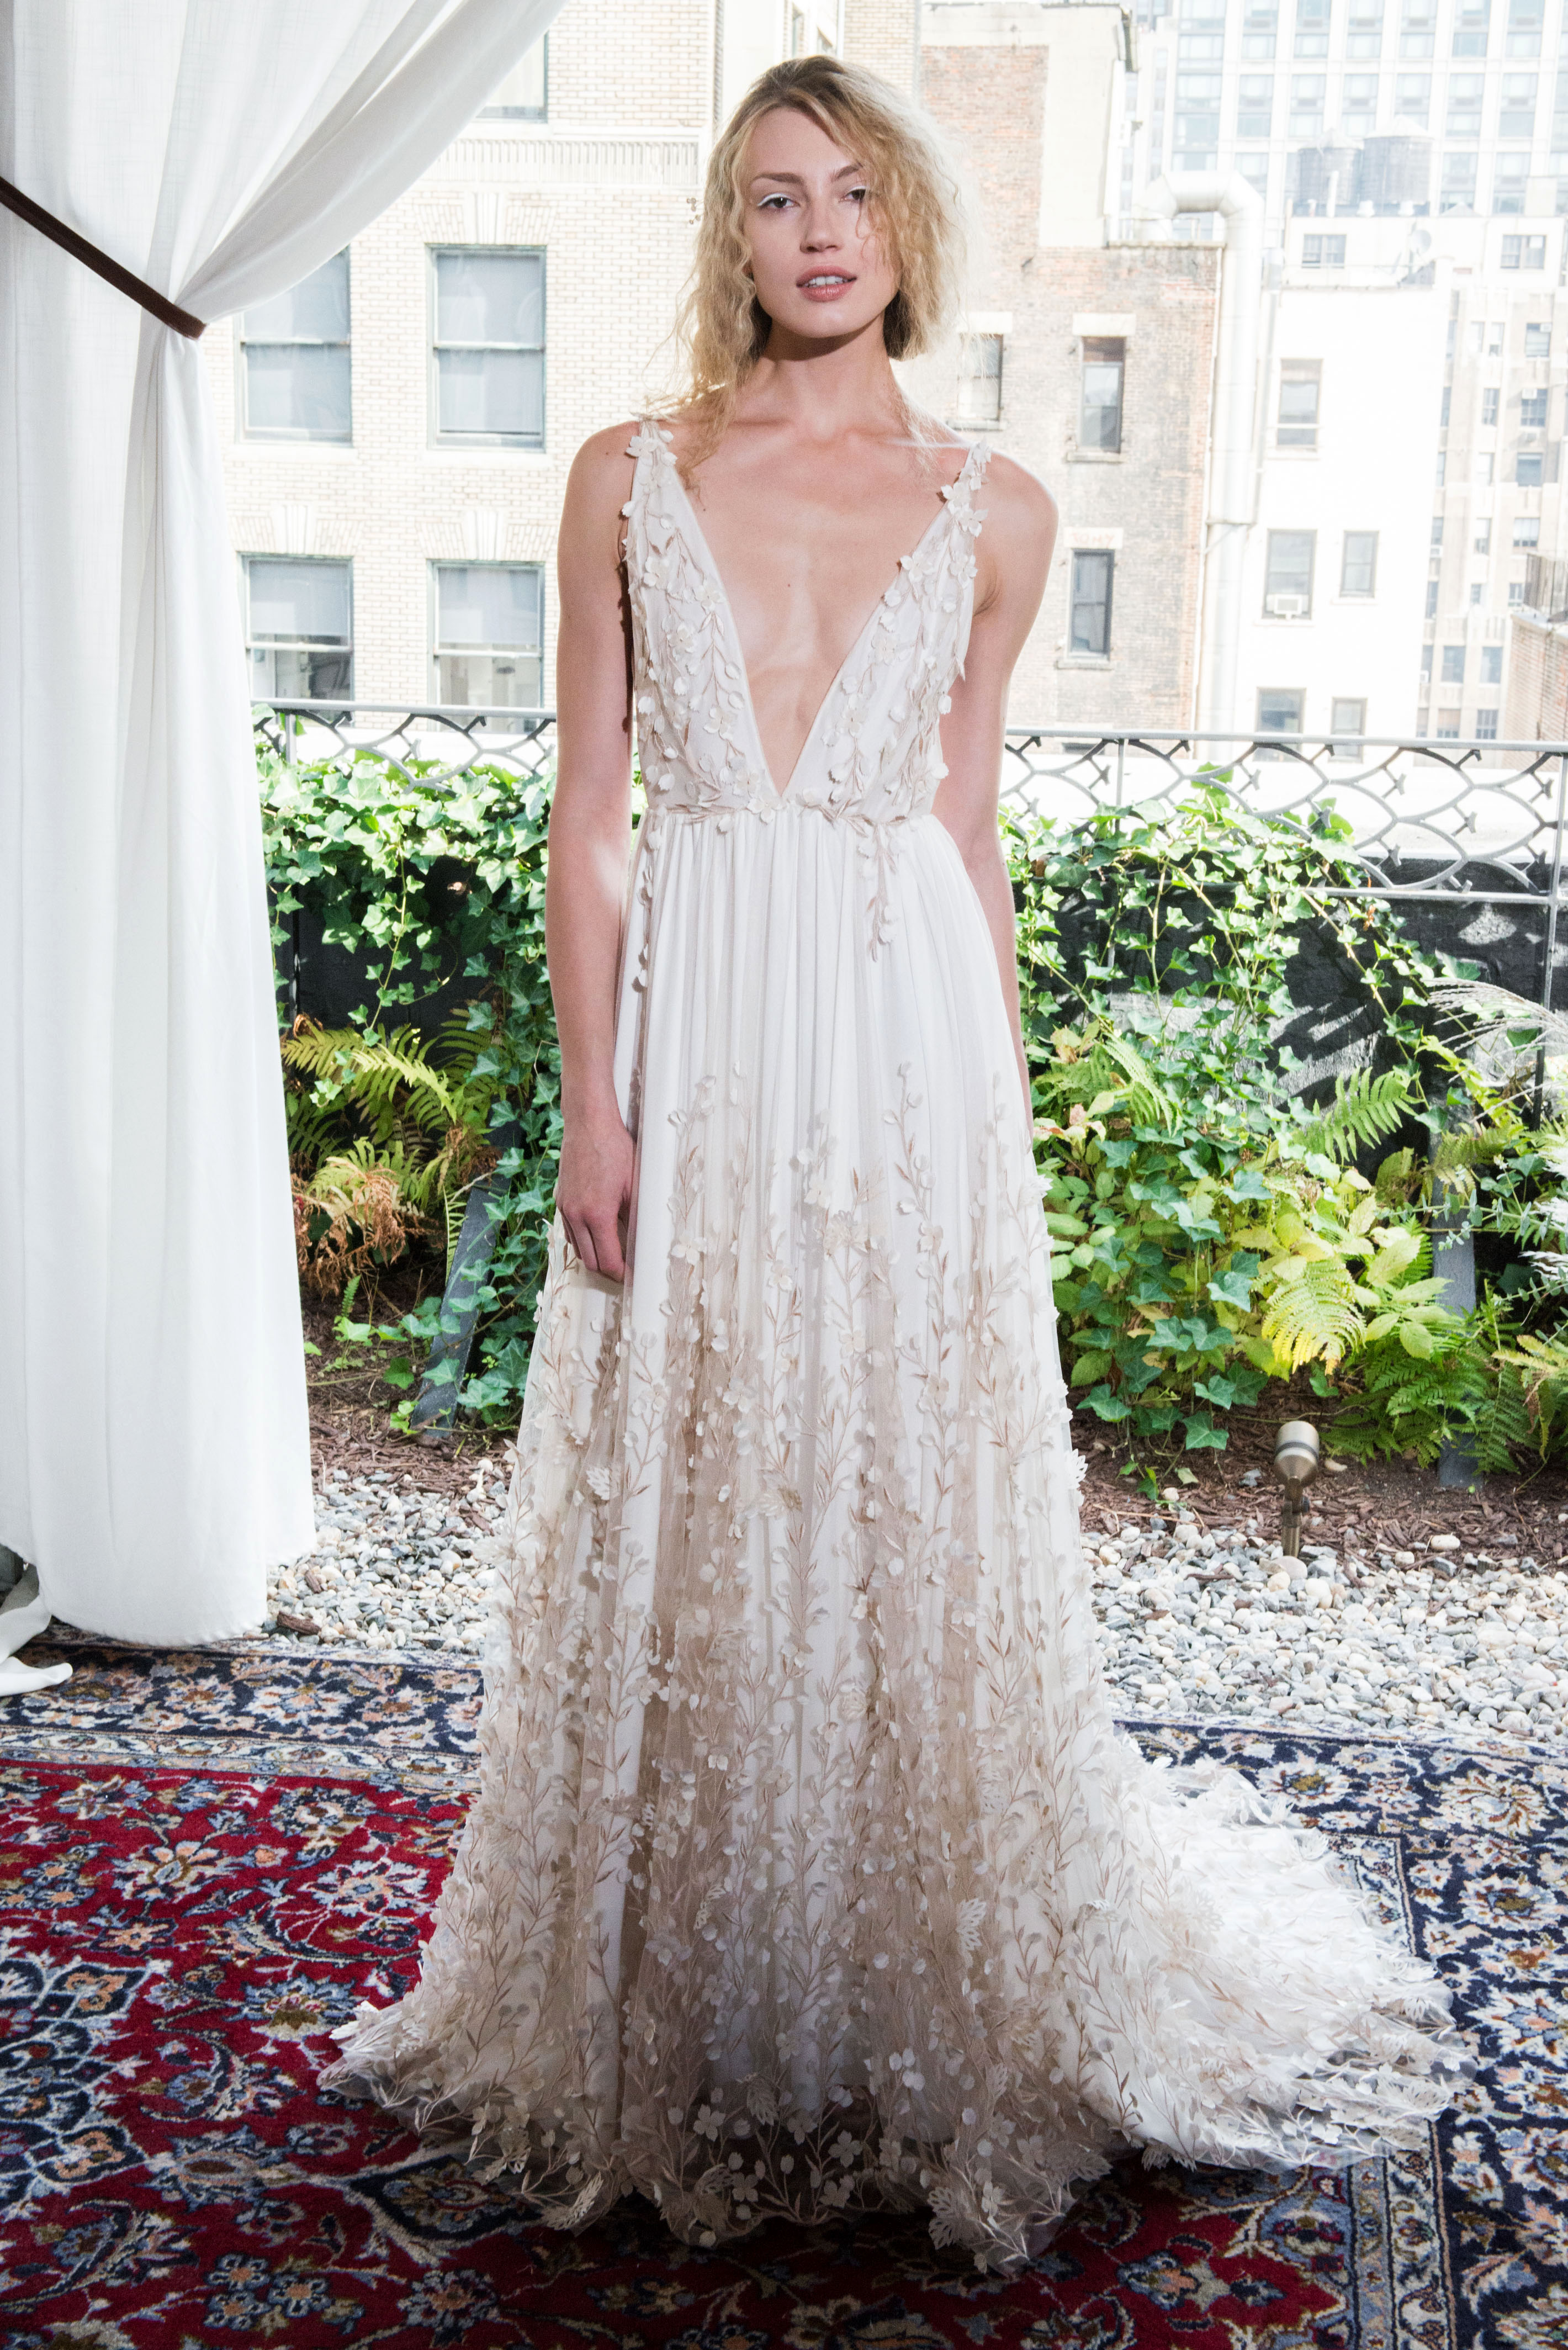 alexandra grecco wedding dress fall 2018 v-neck embellished sleeveless a-line